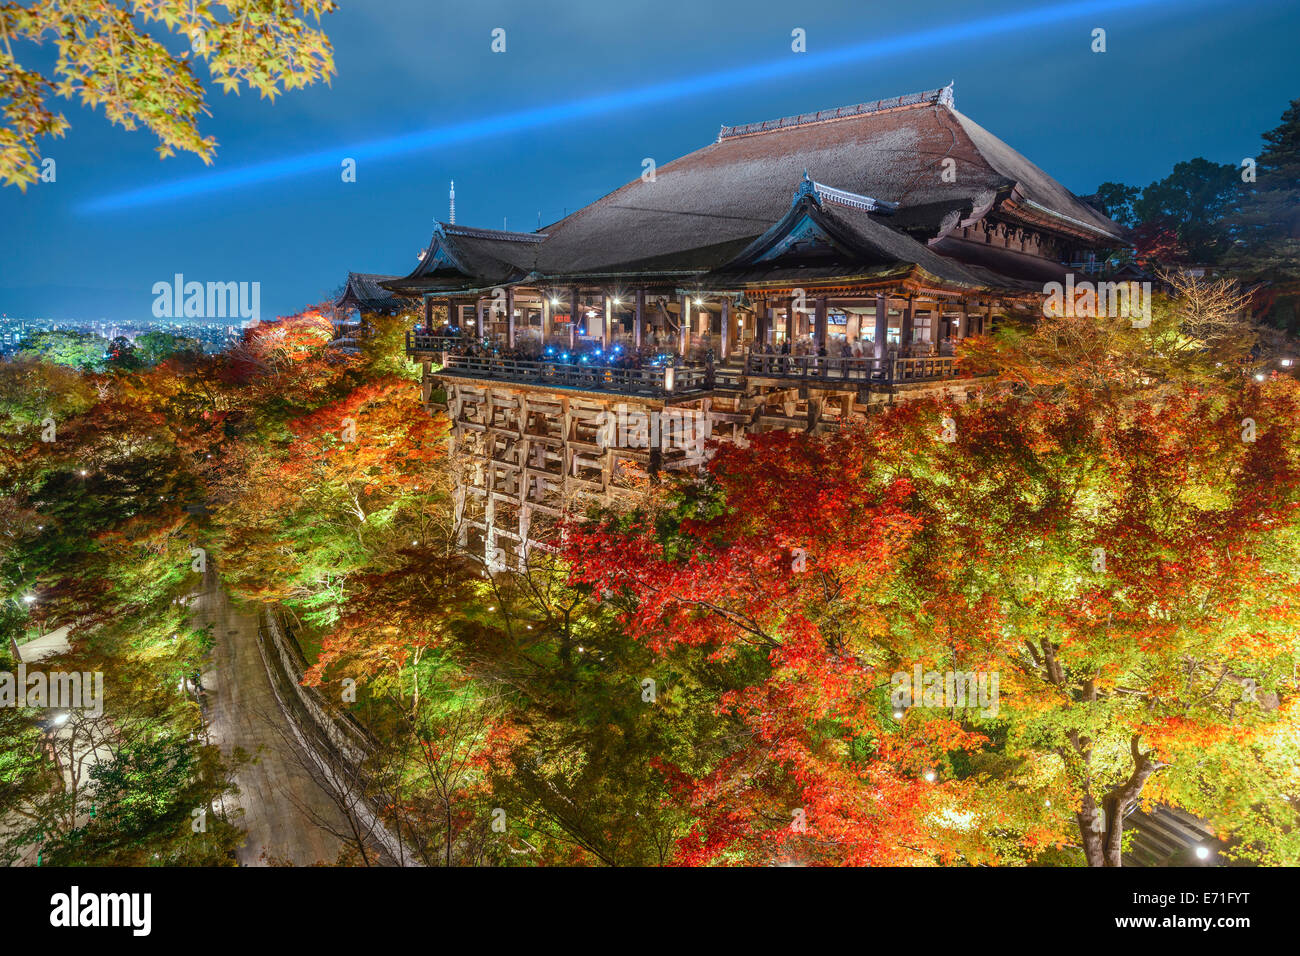 Kyoto, Japan at Kiyomizu-dera Temple in the autumn sesaon. - Stock Image